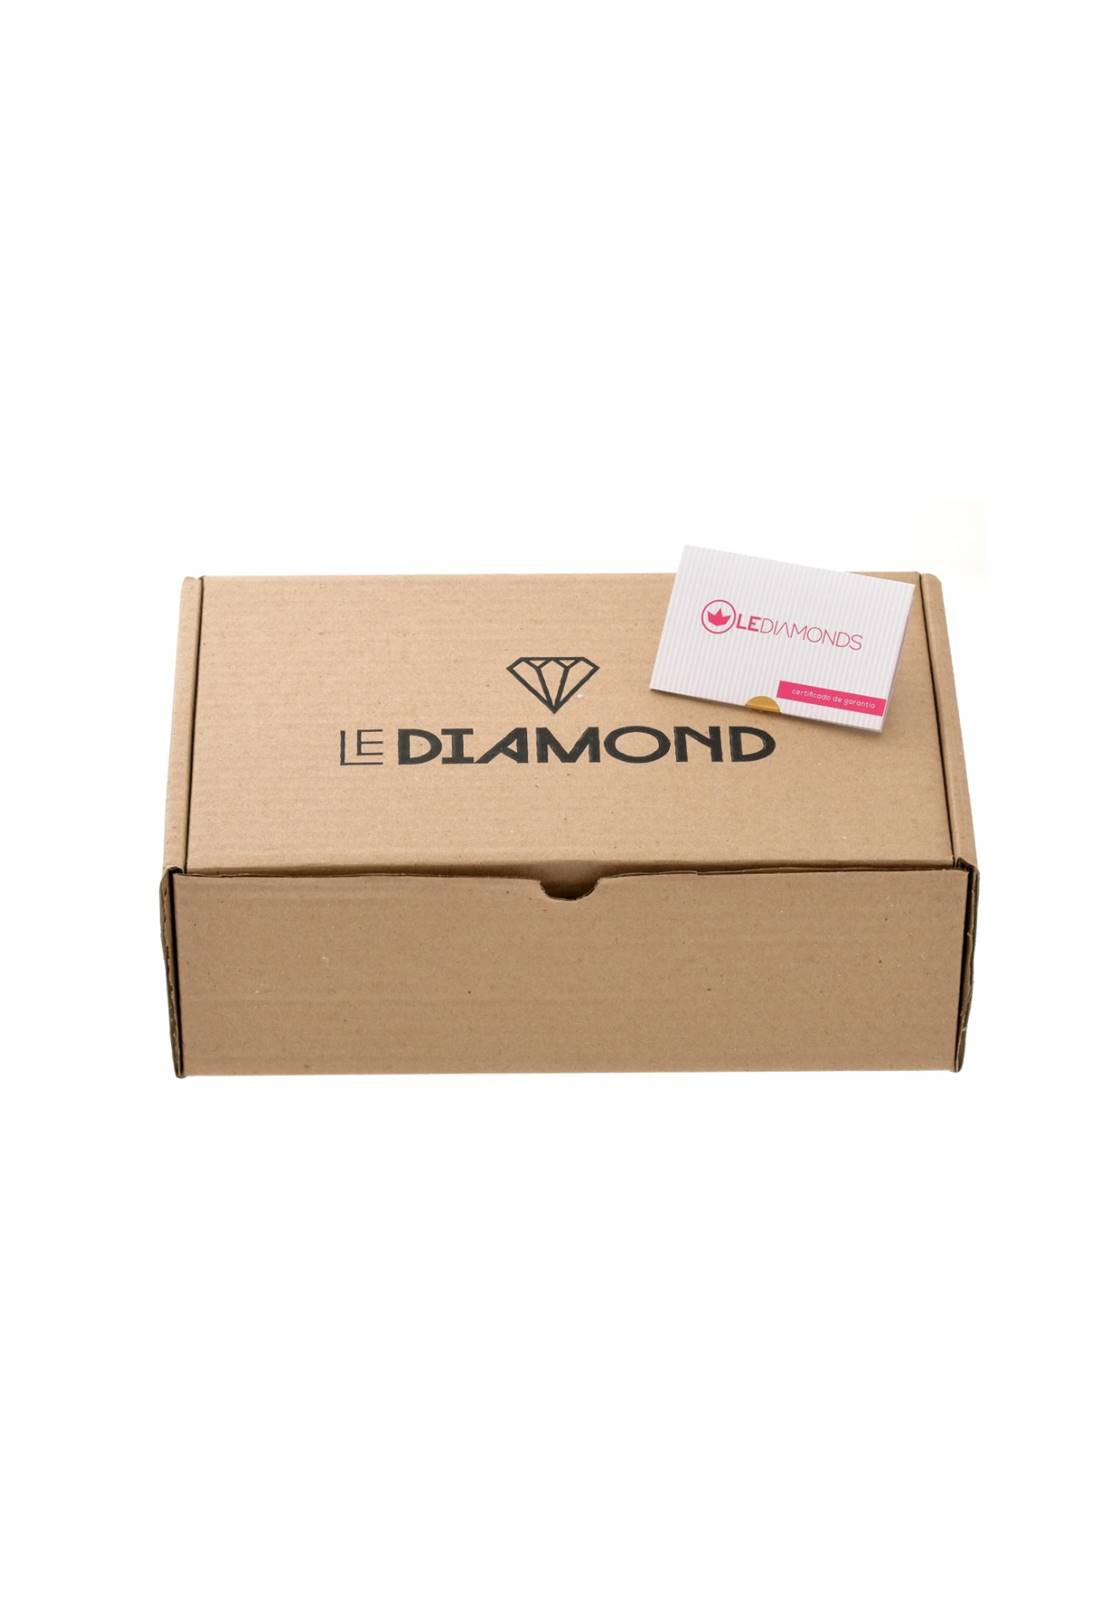 Brinco Le Diamond Chapa Vórtice Dourado com Pingente Azul